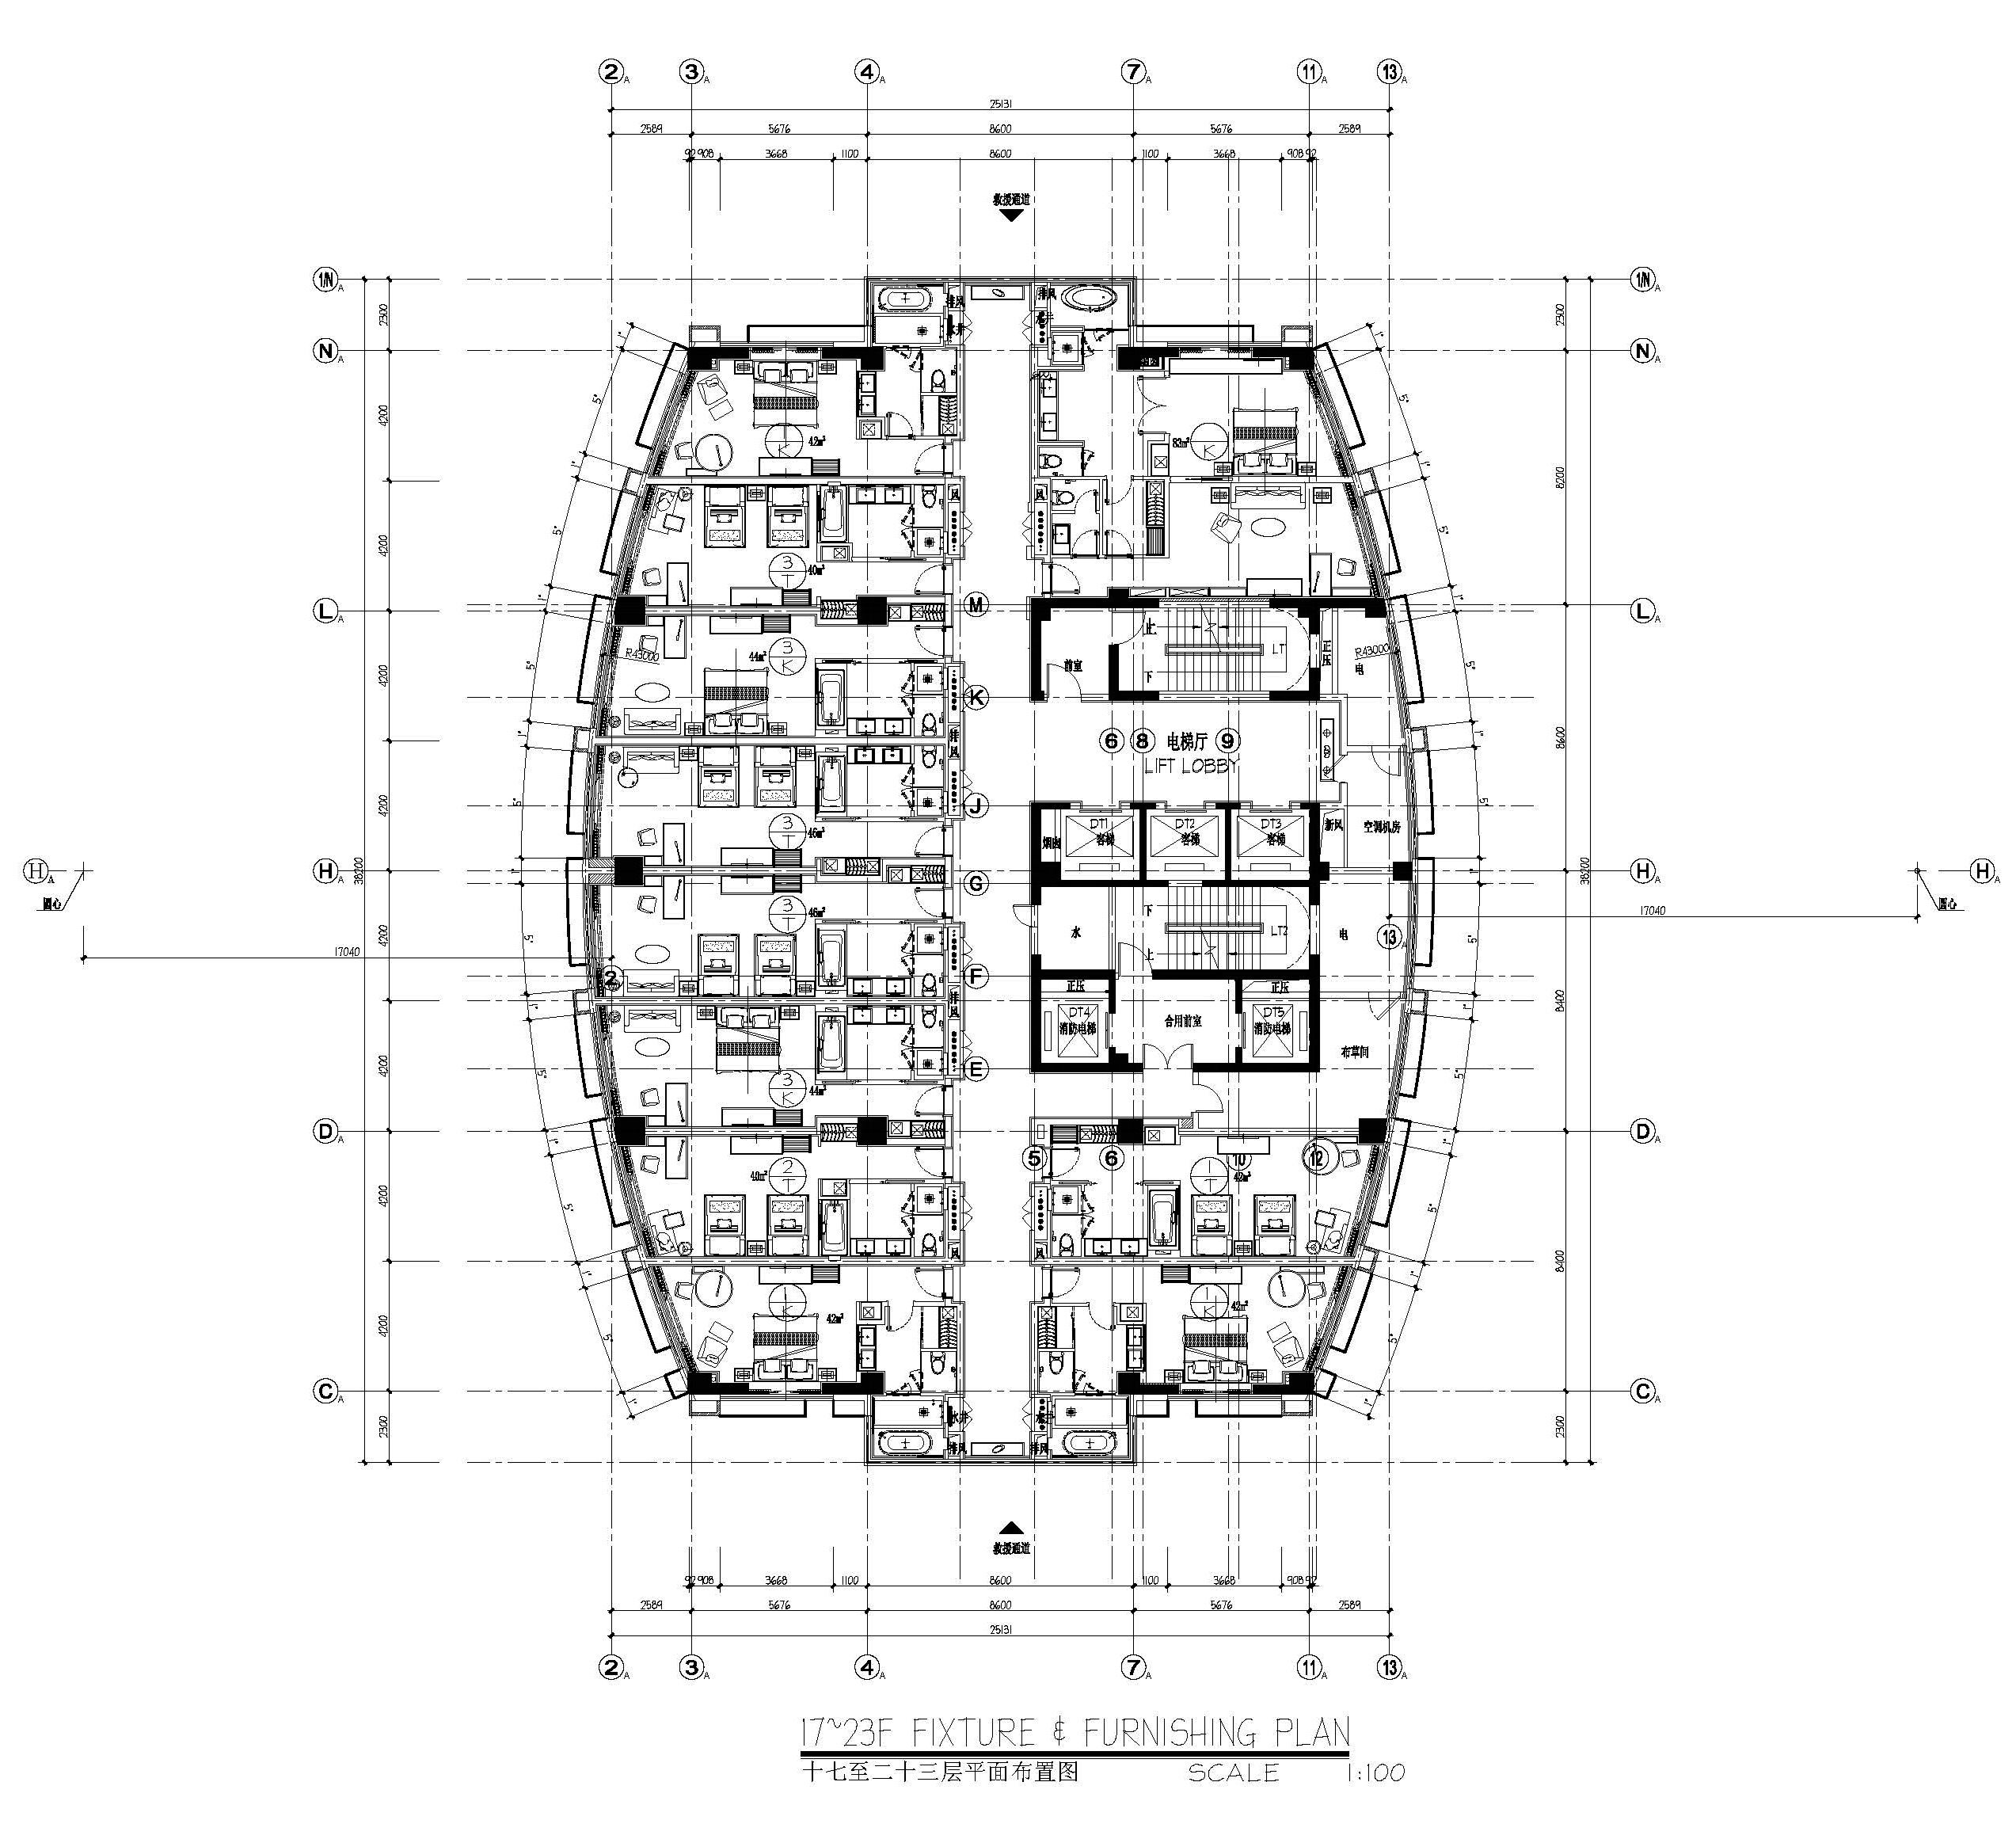 Pullman Rongjin Hotel Hotel Floor Plan Architectural Floor Plans Residential Architecture Plan